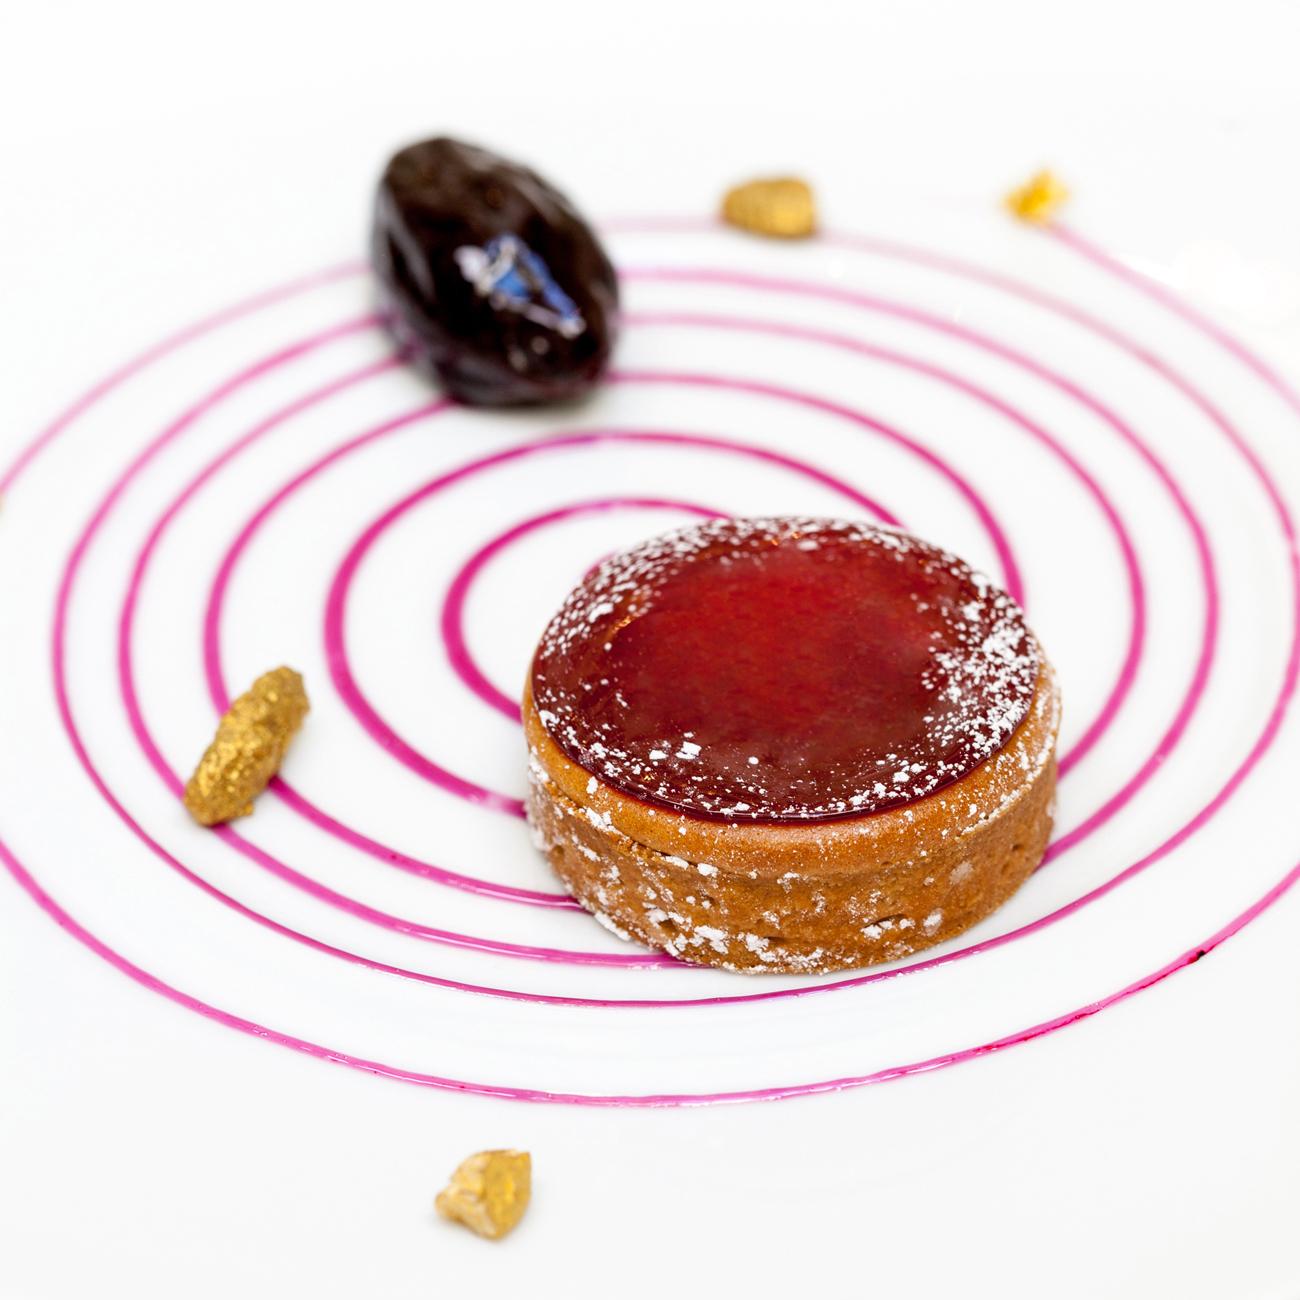 Tartelette-soufflee-aux-pruneaux-d-Agen-bristol-laurent-jeannin